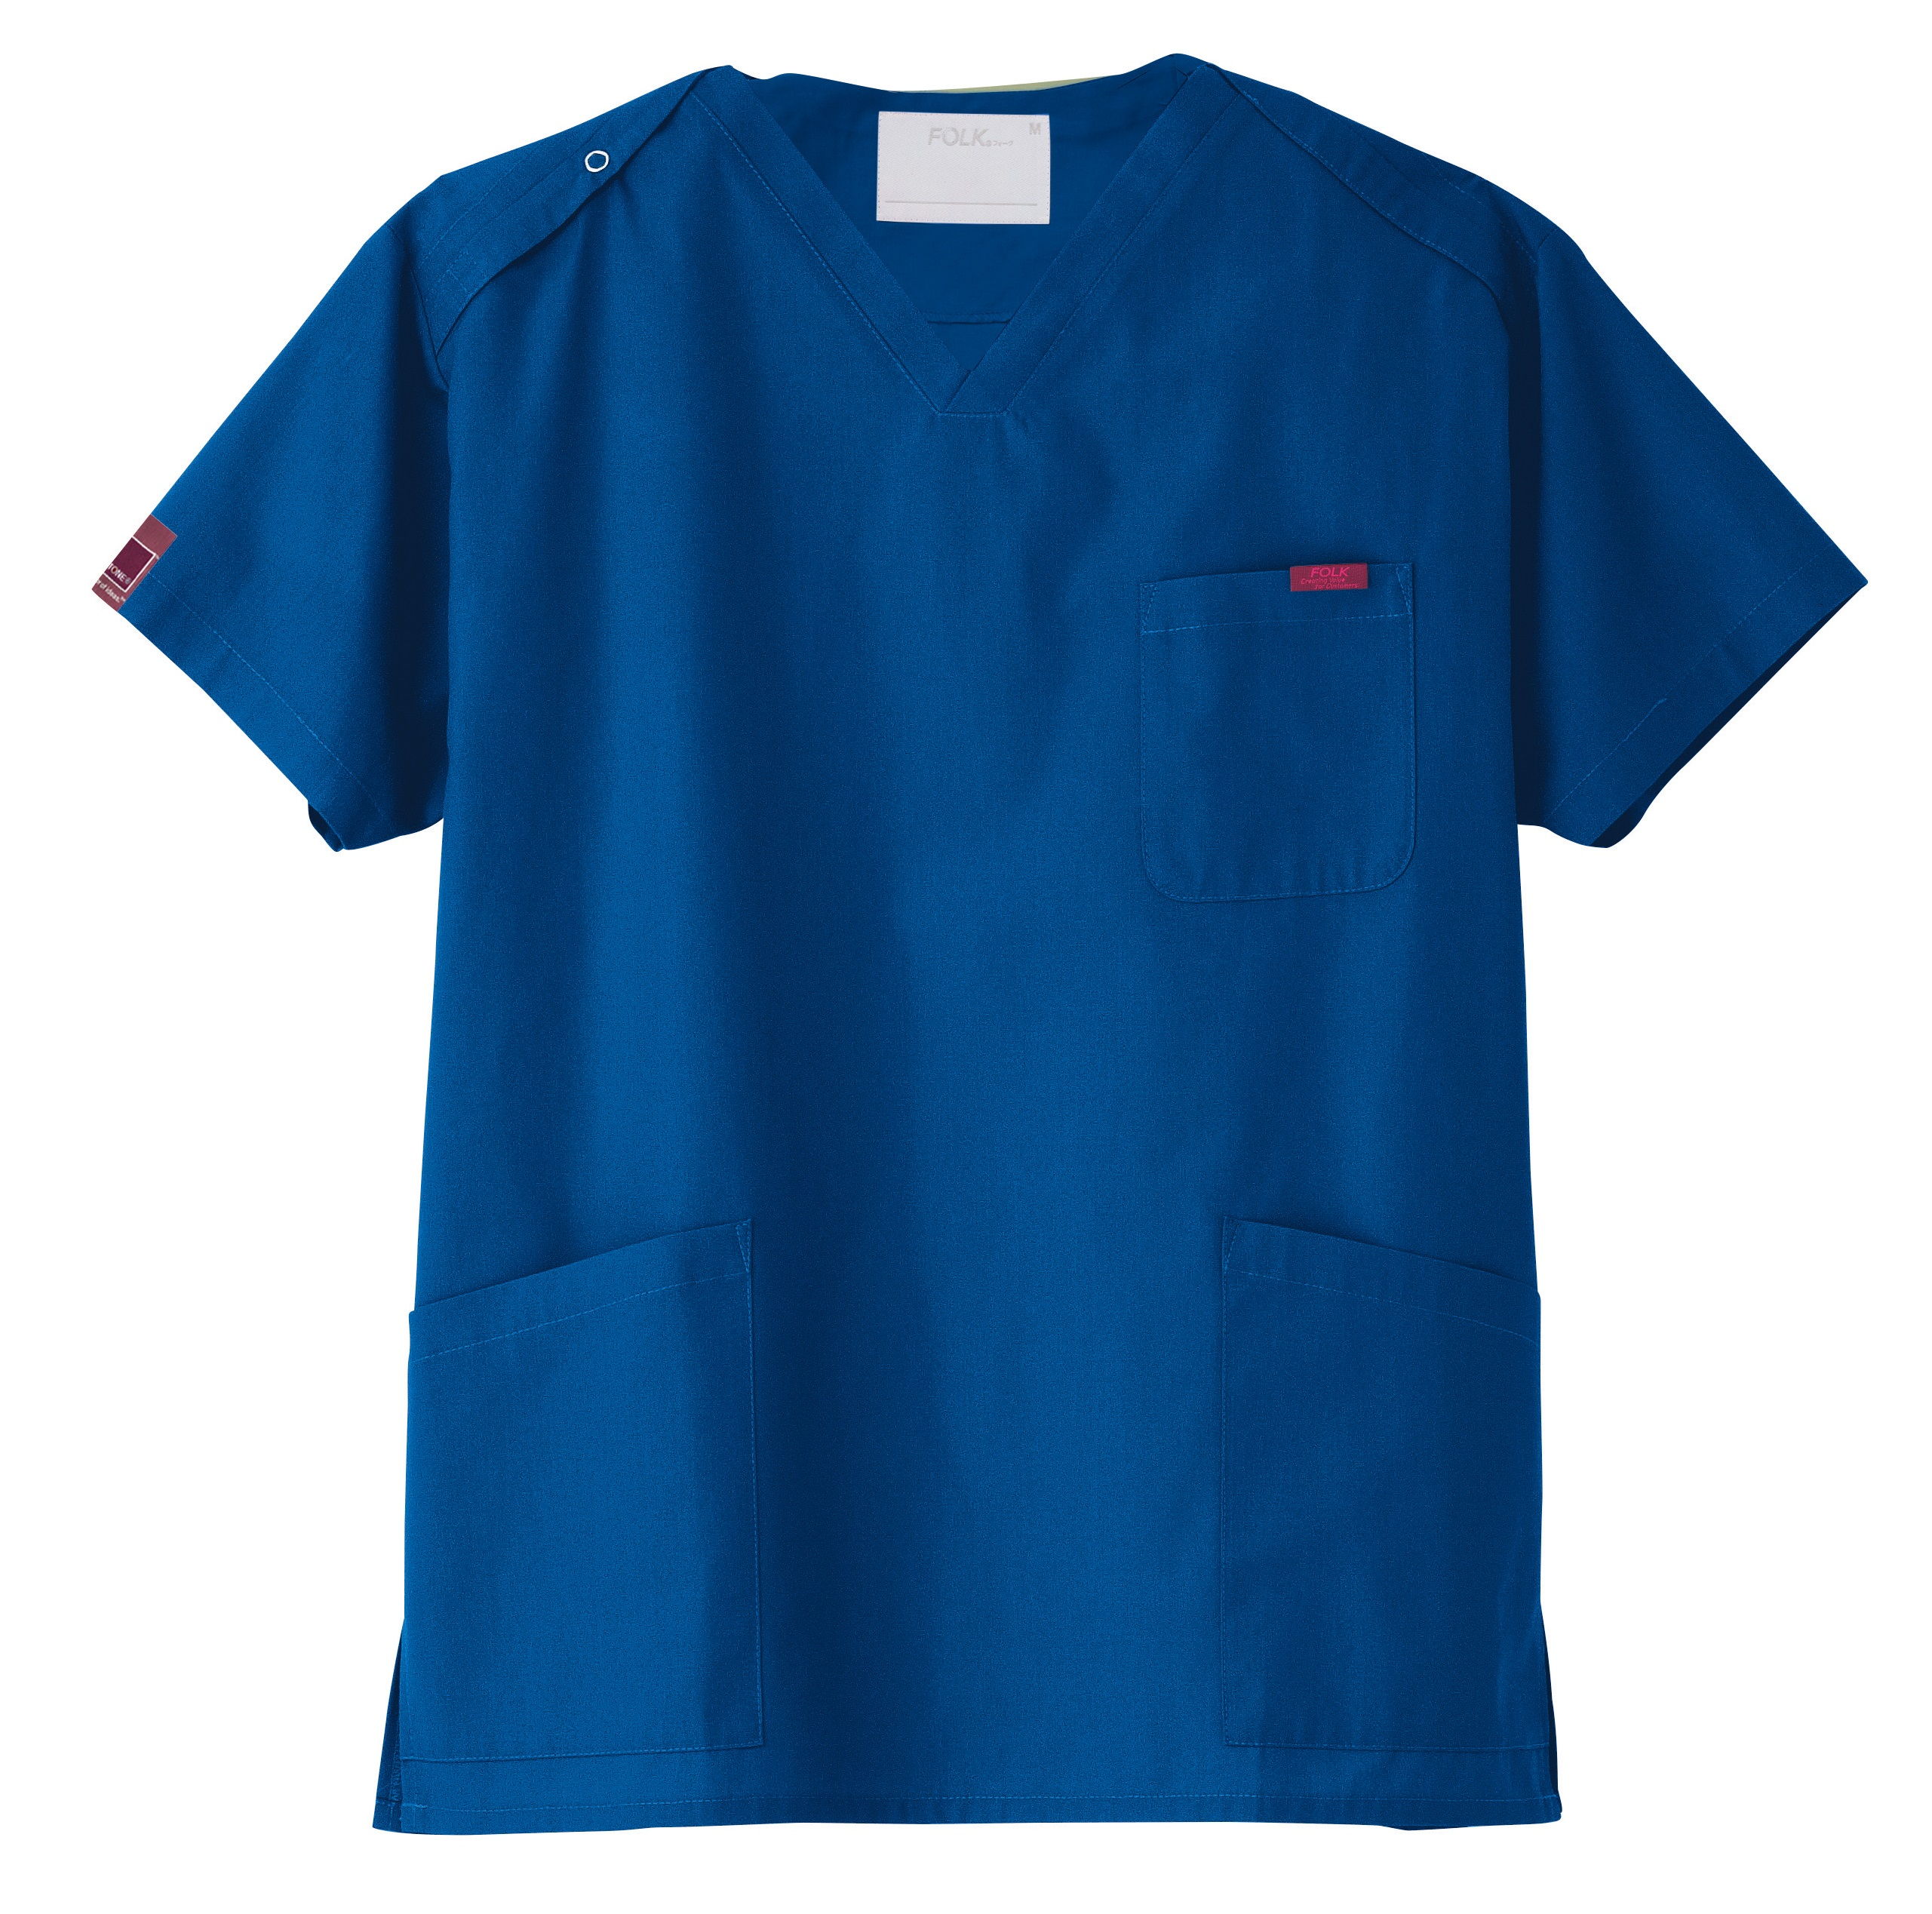 PANTONE スクラブ(男女兼用)販売。刺繍、プリント加工対応します。研修医、医療チームウェアに人気